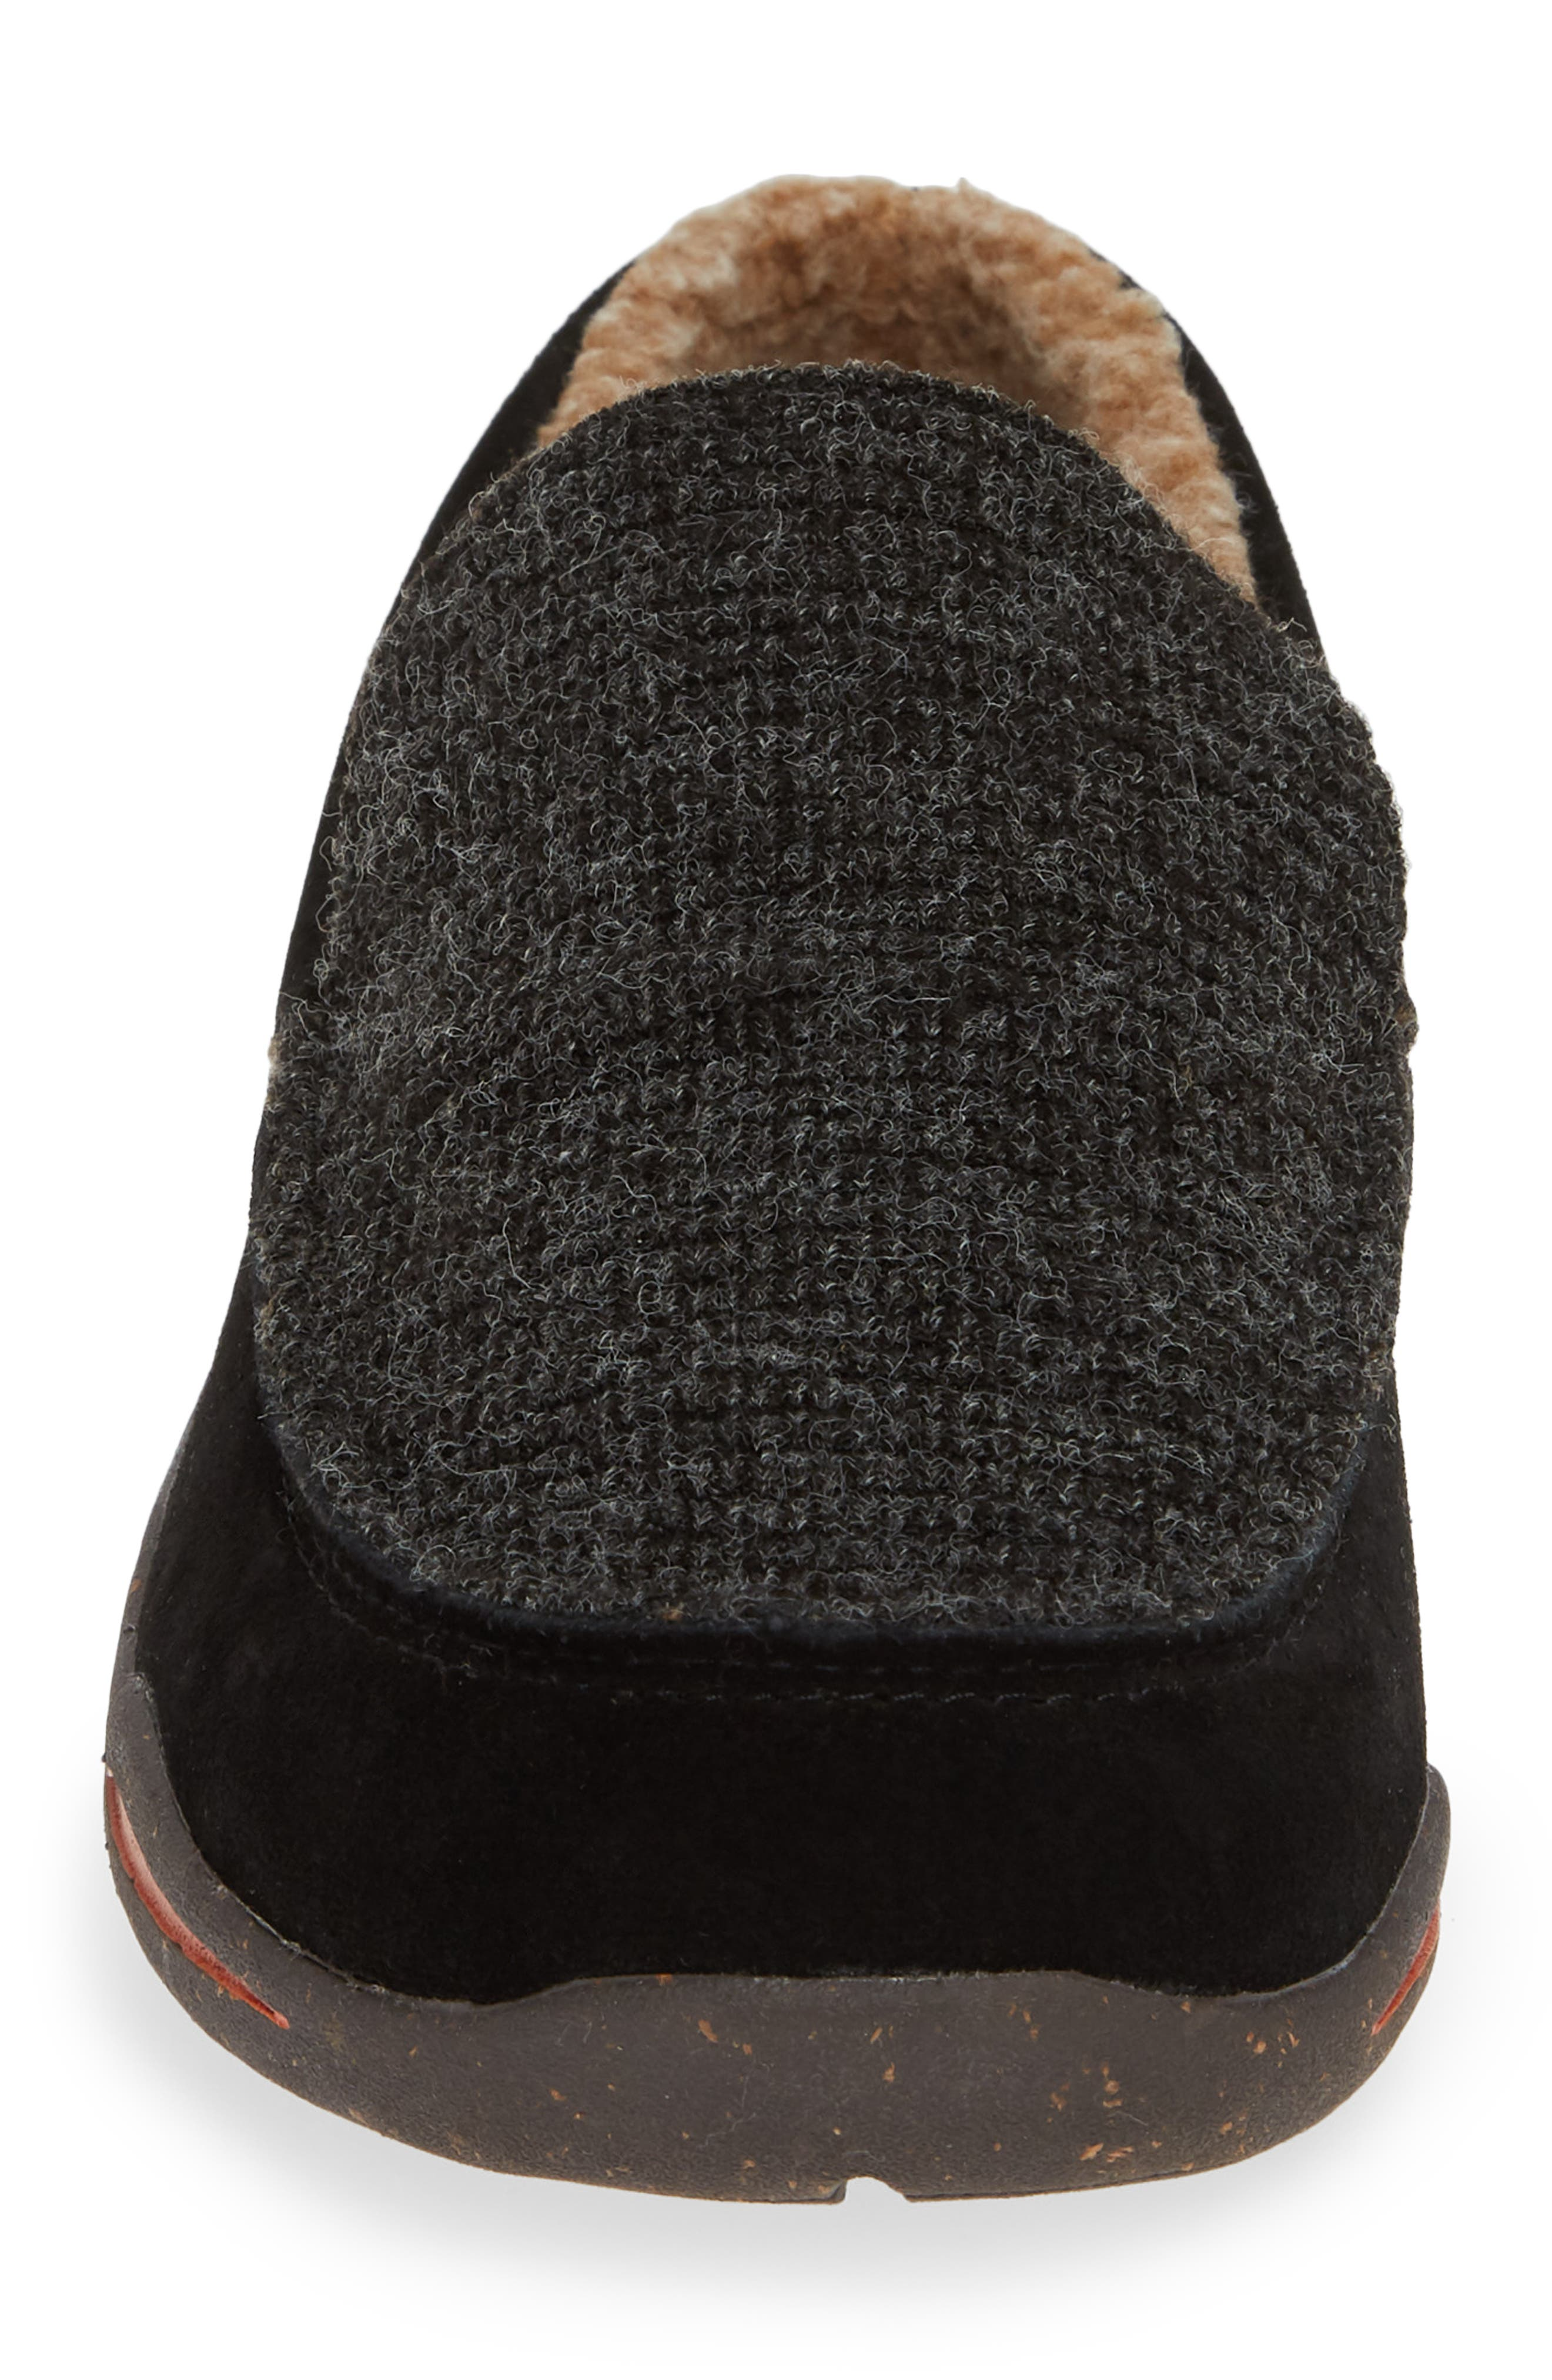 ACORN, Ellsworth Moc Toe Slipper, Alternate thumbnail 4, color, BLACK